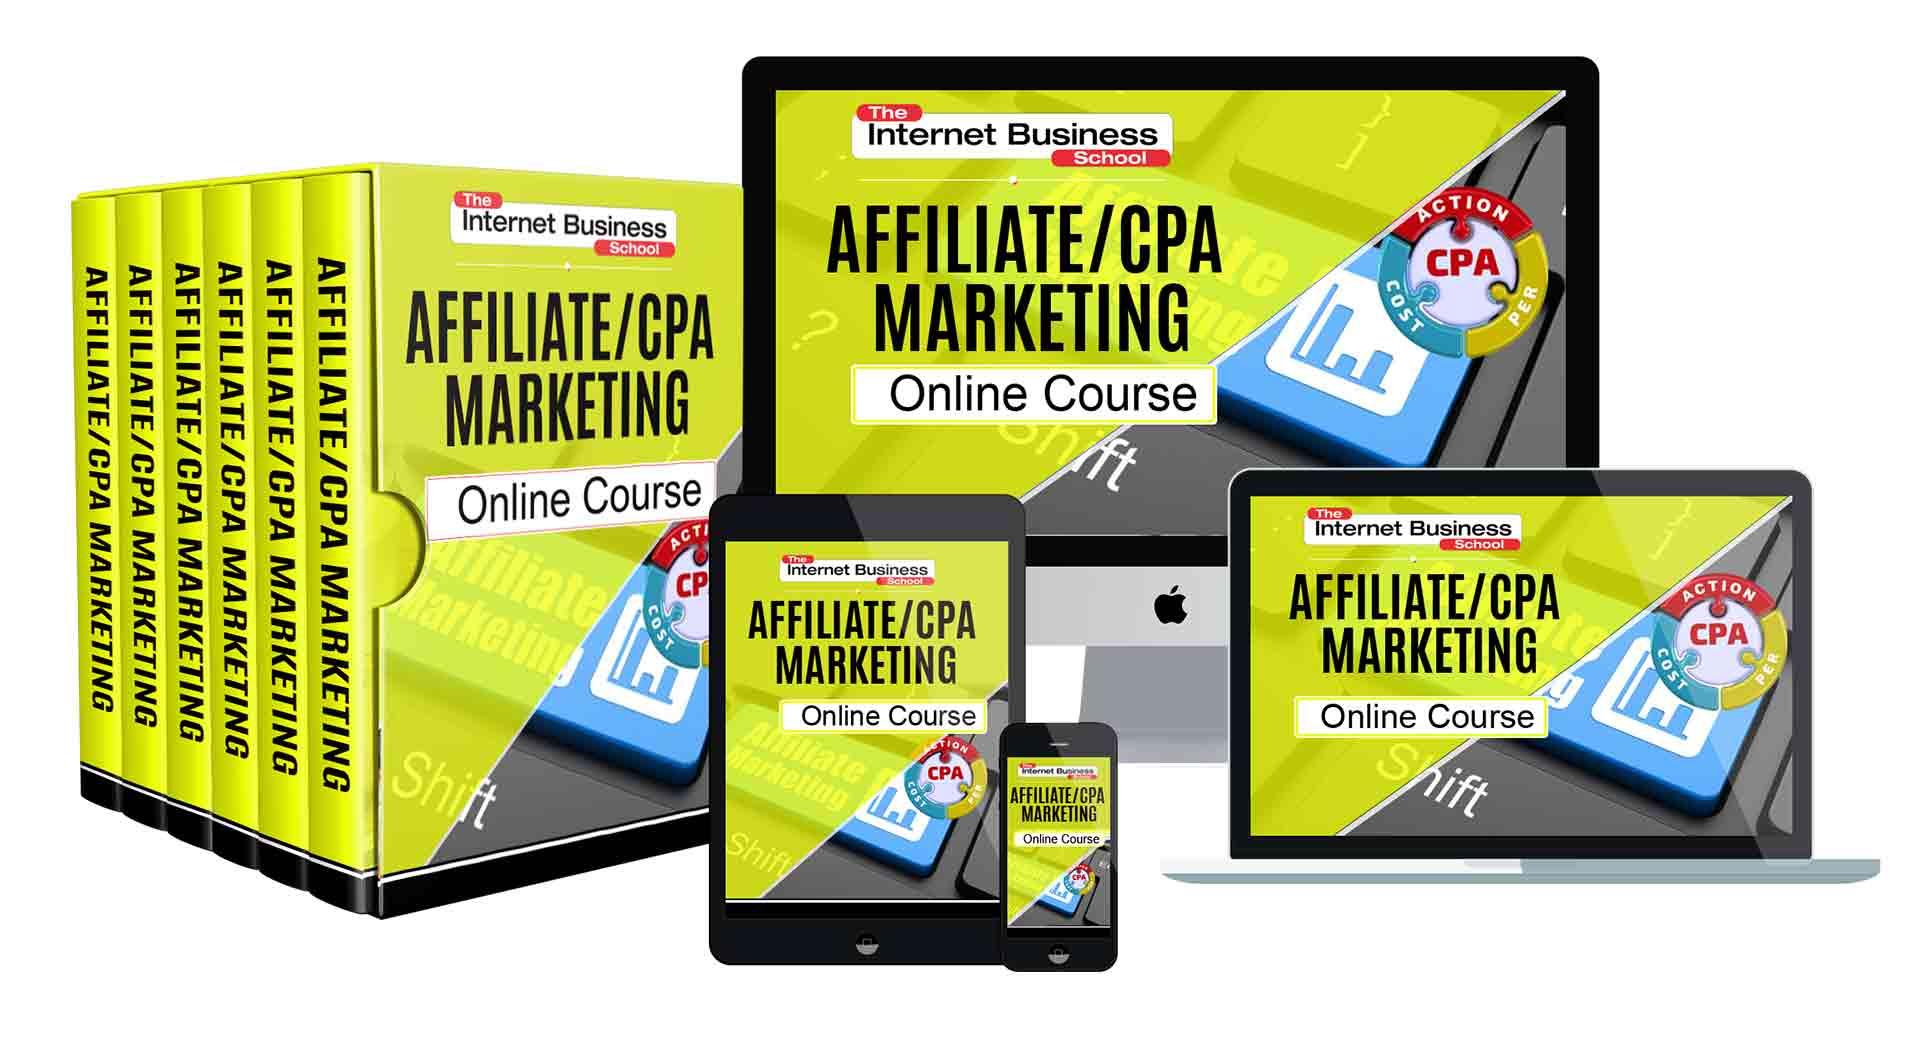 Affiliate / CPA Marketing Course